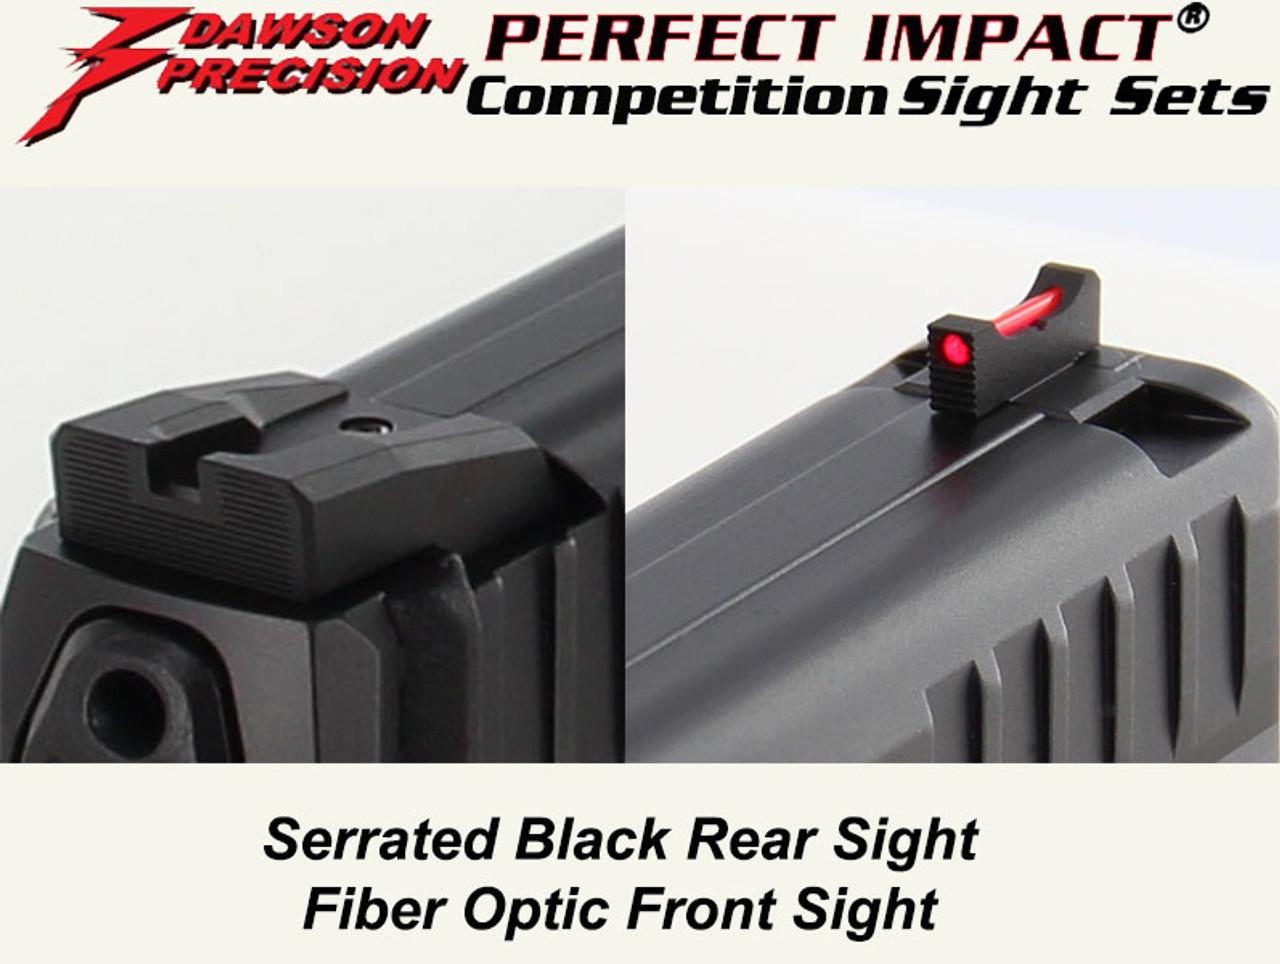 Dawson Precision HK VP9 Fixed Competition Sight Set - Black Rear & Fiber  Optic Front